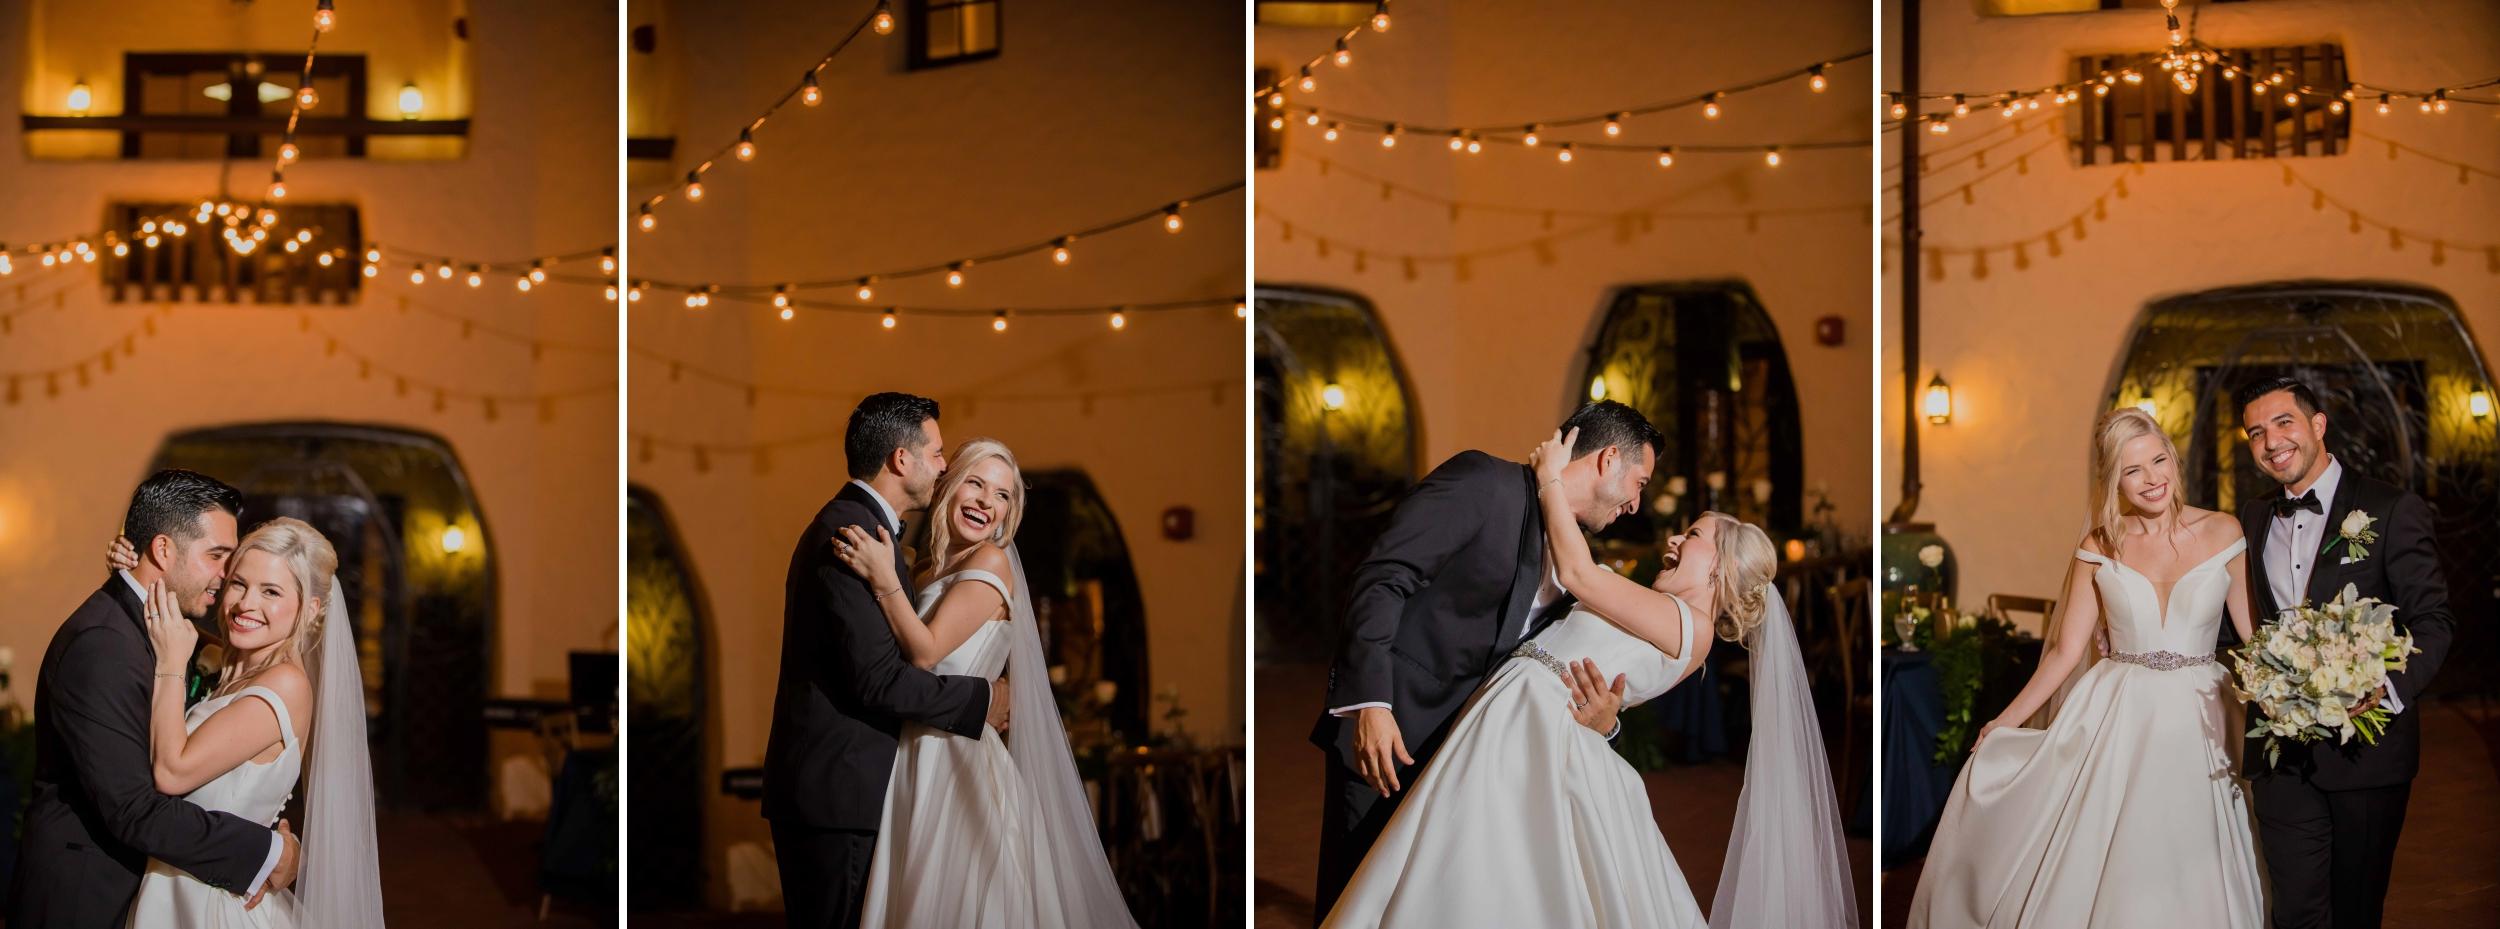 Santy Martinez - Curtiss Masion Wedding 13.jpg